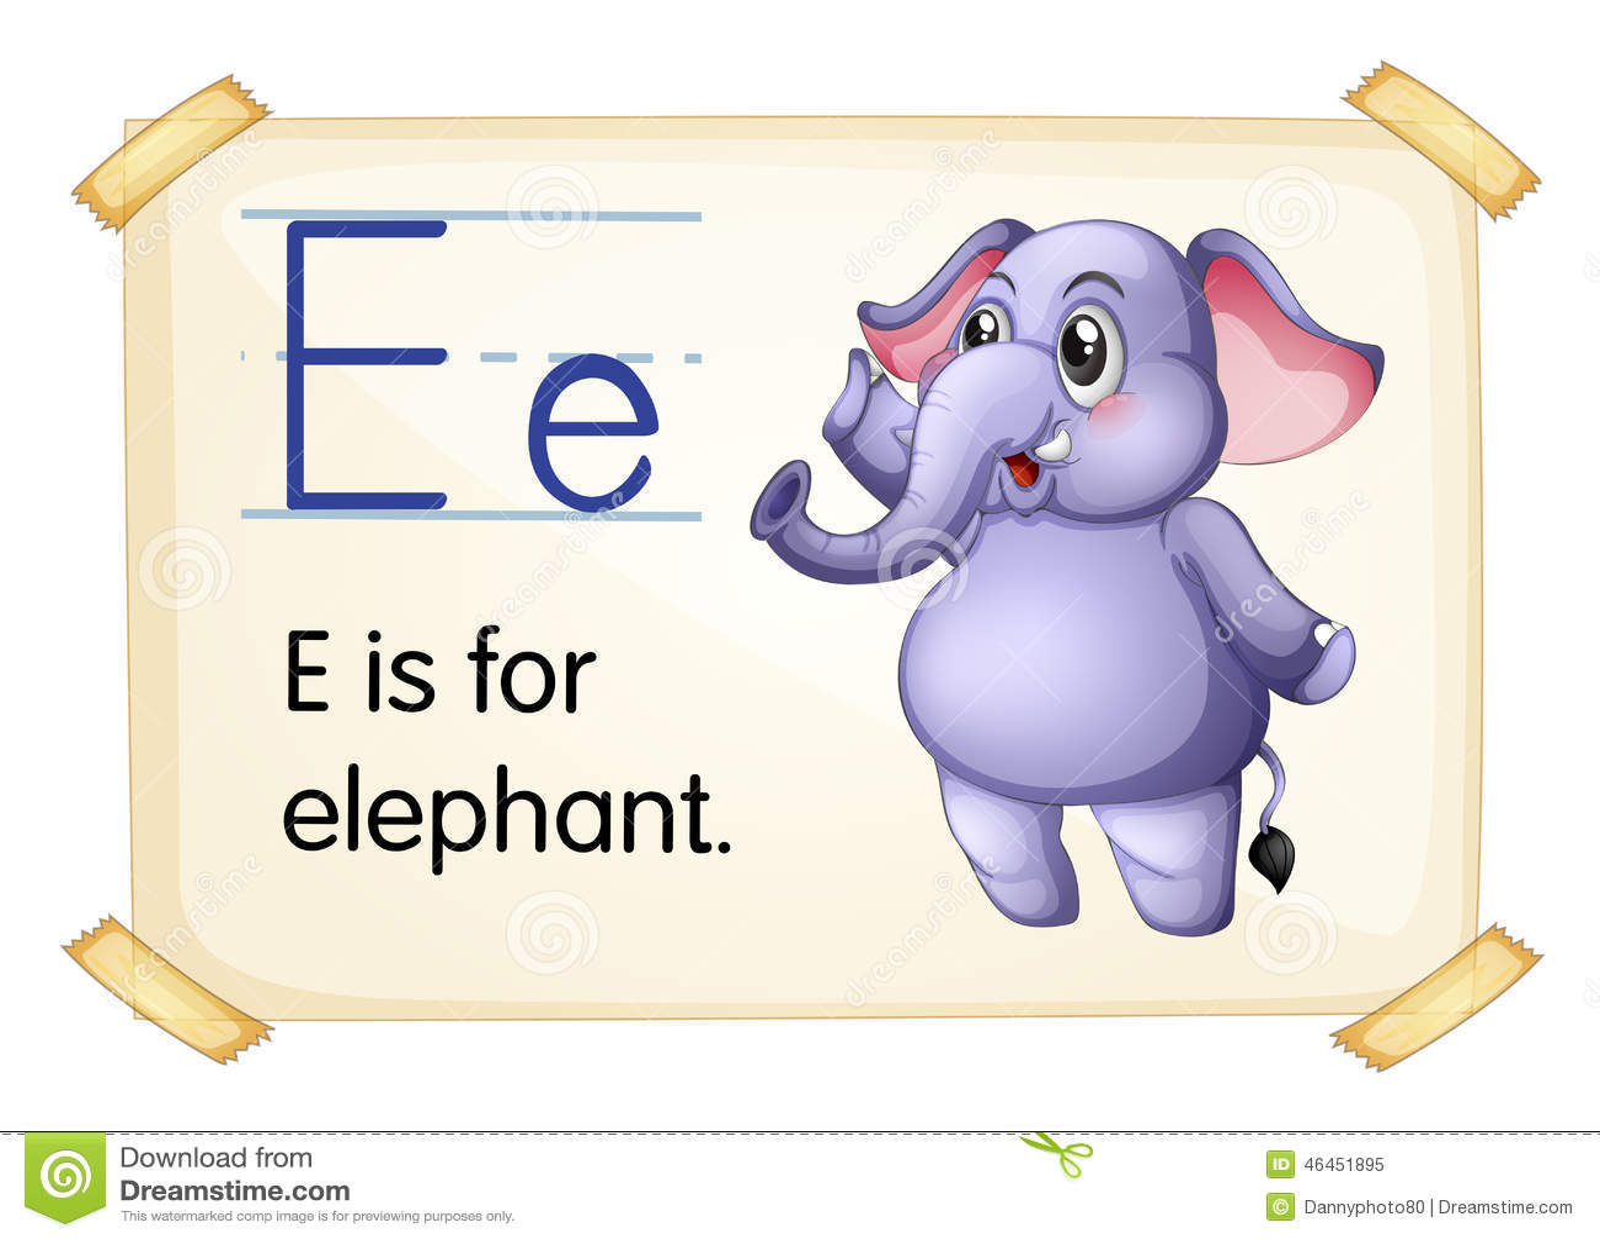 Elephant Flashcard Stock Vector Illustration Of Spelling